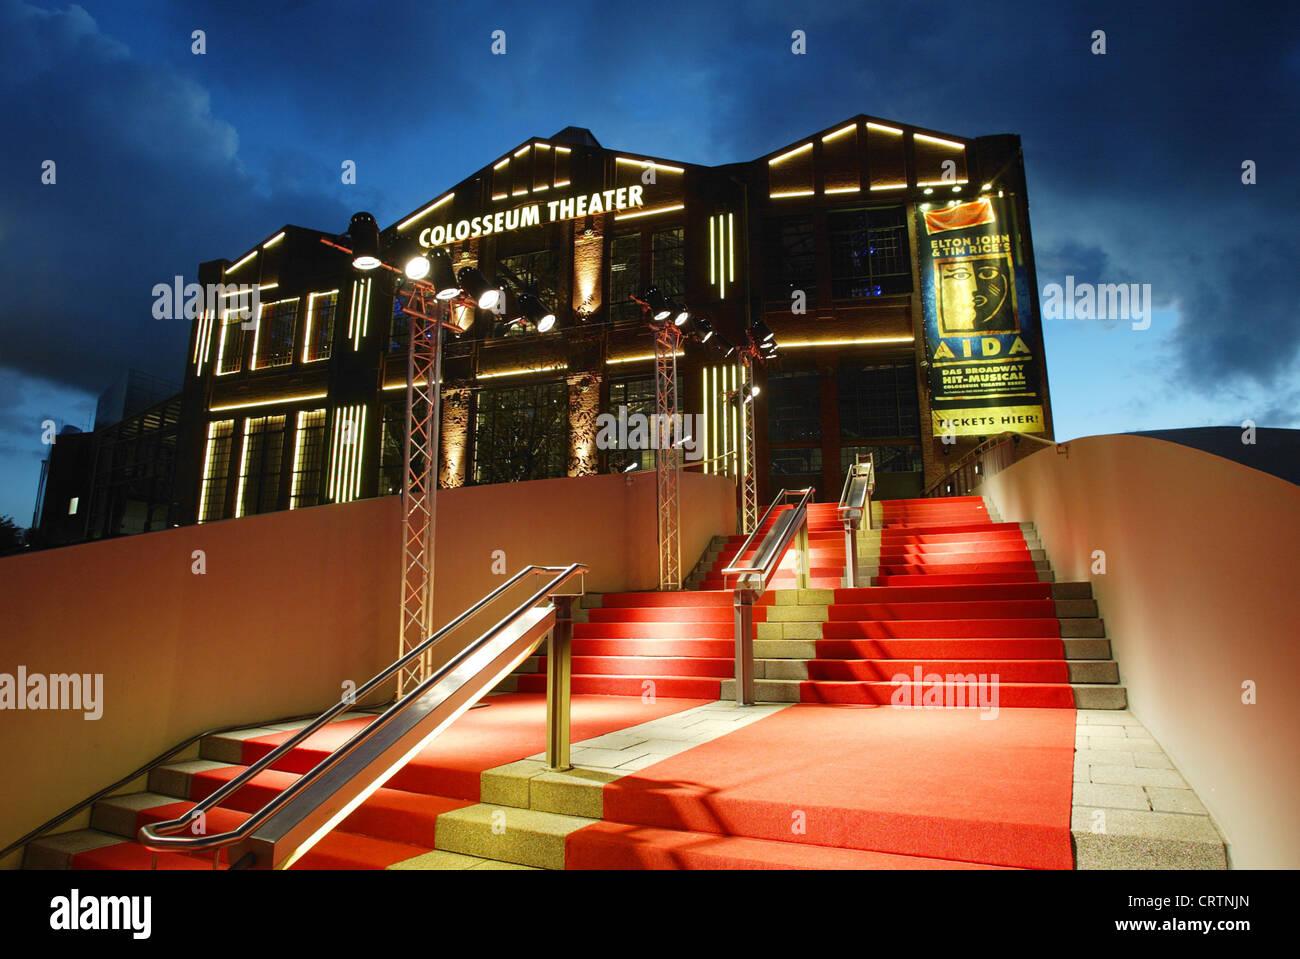 colosseum theater in essen musical aida stock photo. Black Bedroom Furniture Sets. Home Design Ideas